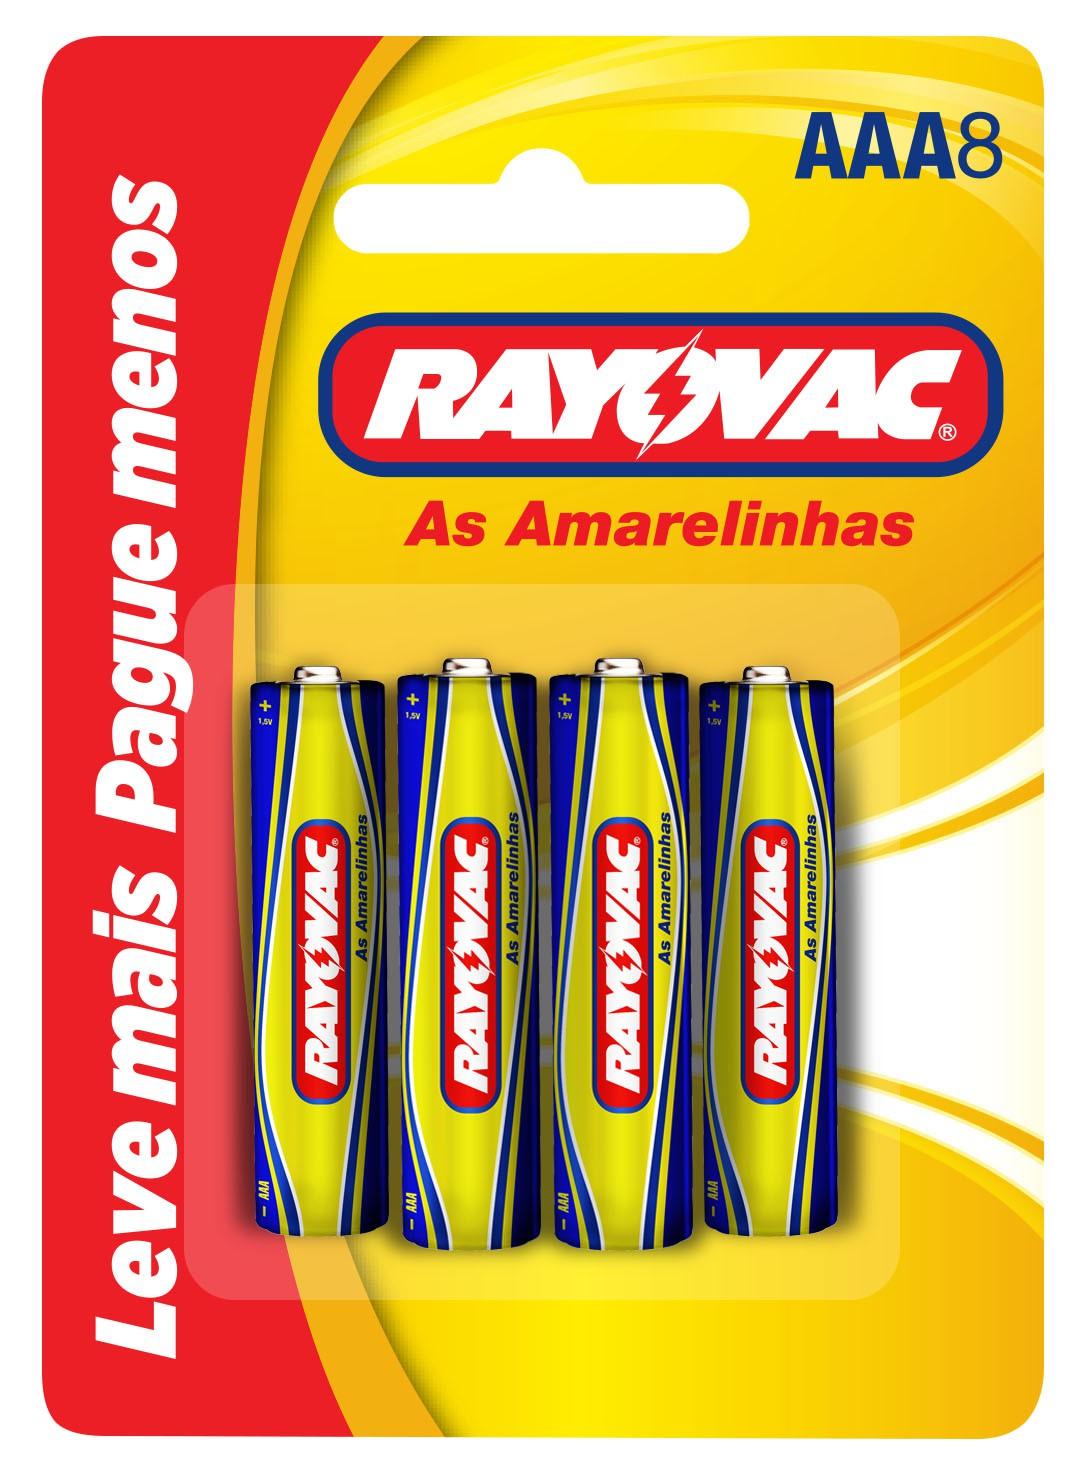 24 Pilhas AAA Zinco Carvão RAYOVAC 3 cartelas